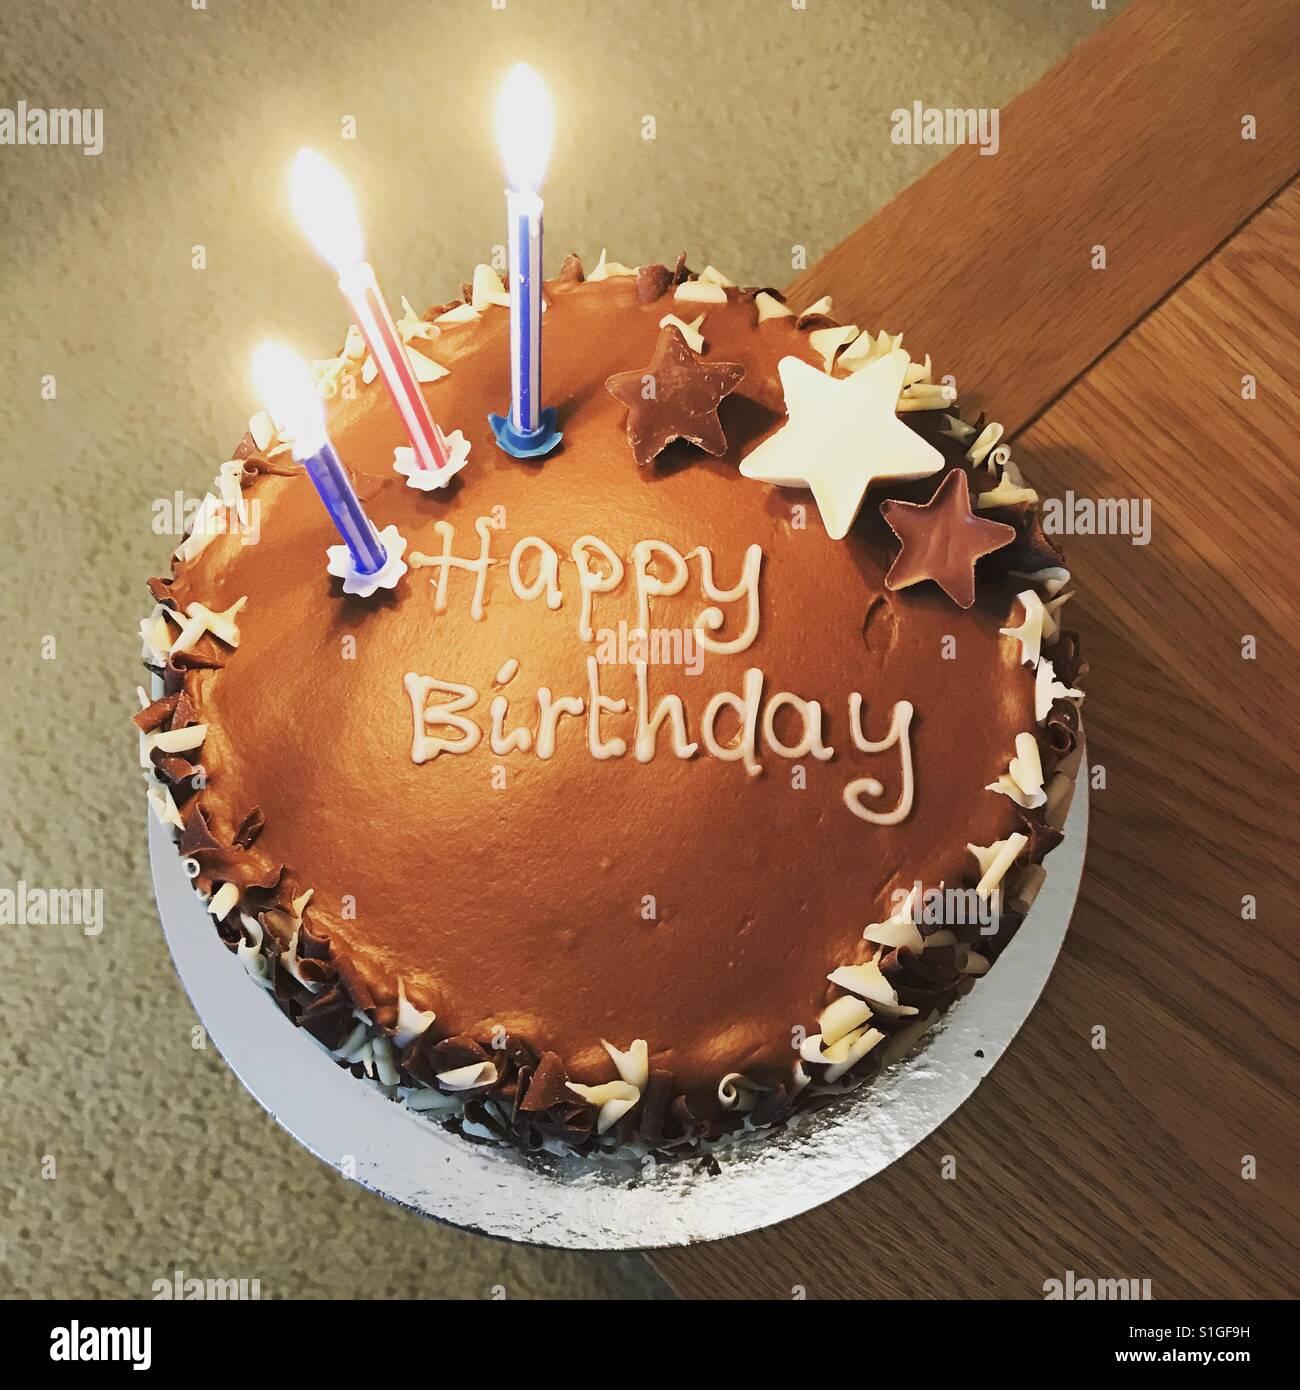 Terrific Happy Birthday Chocolate Cake Stock Photo 310764541 Alamy Funny Birthday Cards Online Fluifree Goldxyz